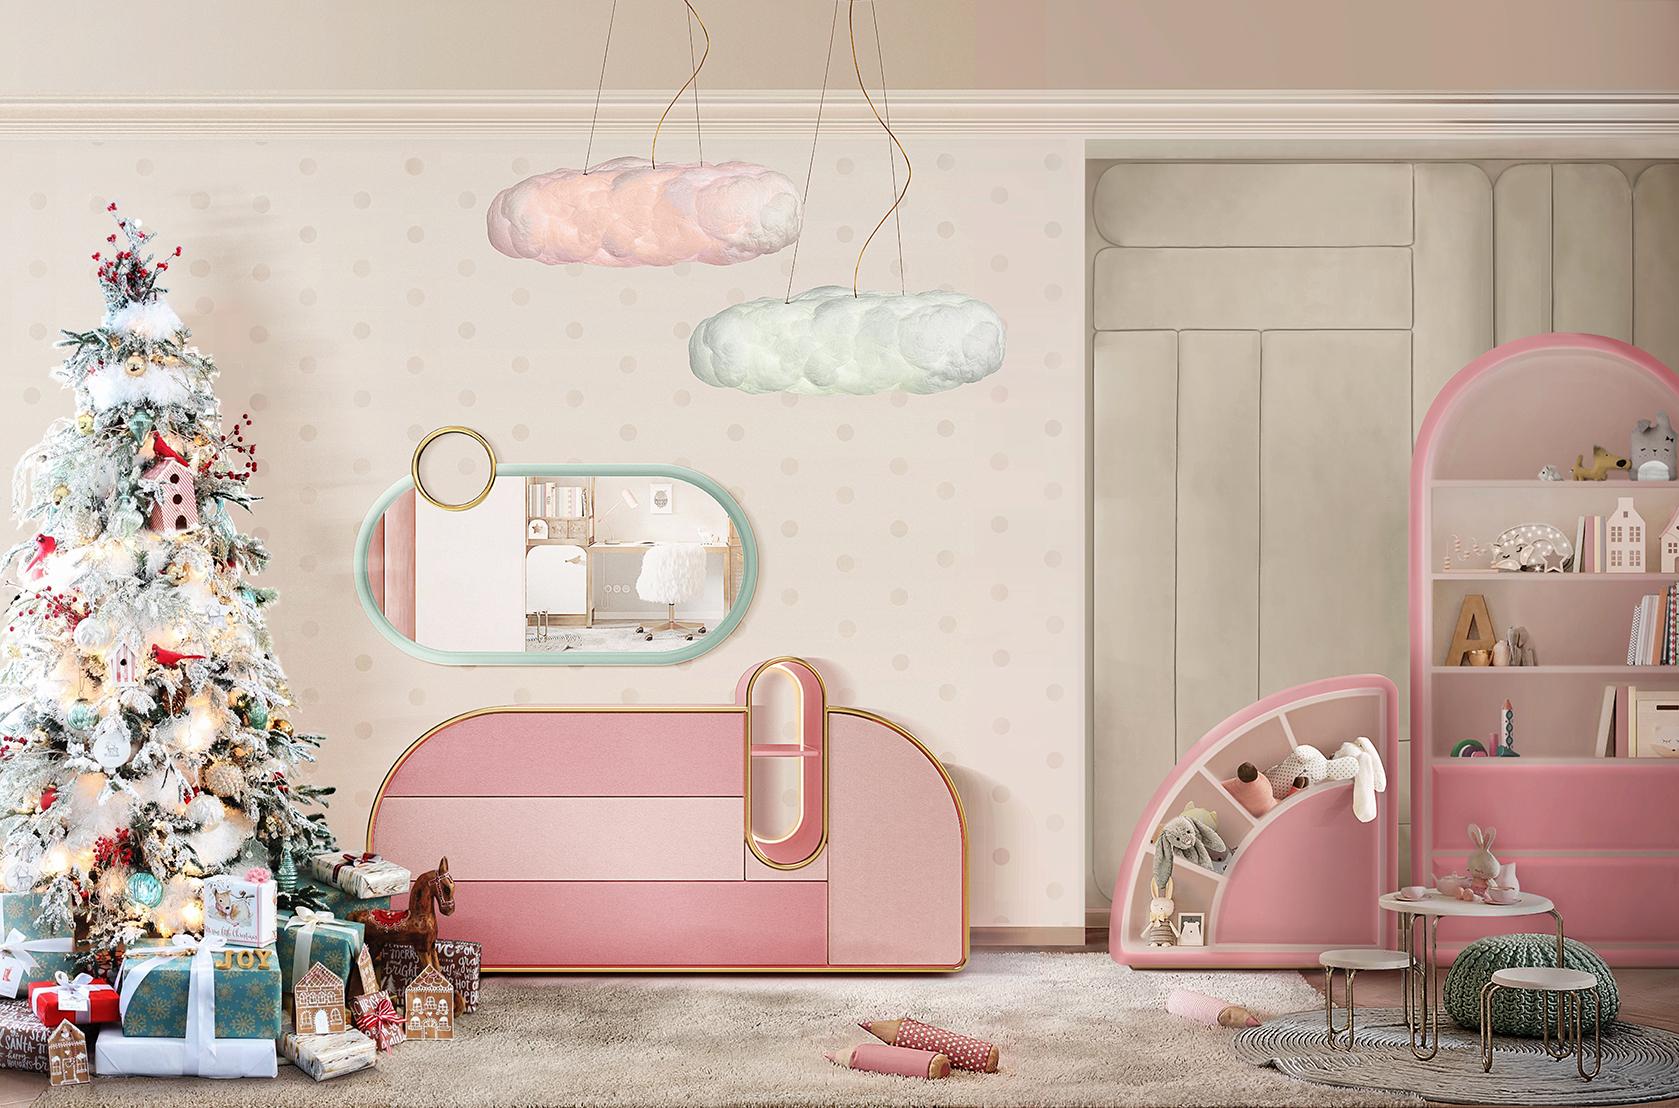 Cofres lujuosos: ideas para poner en un hogar moderno y poderoso cofres lujuosos Cofres lujuosos: ideas para poner en un hogar moderno y poderoso bubble gum chest 3 drawers circu magical furniture 8